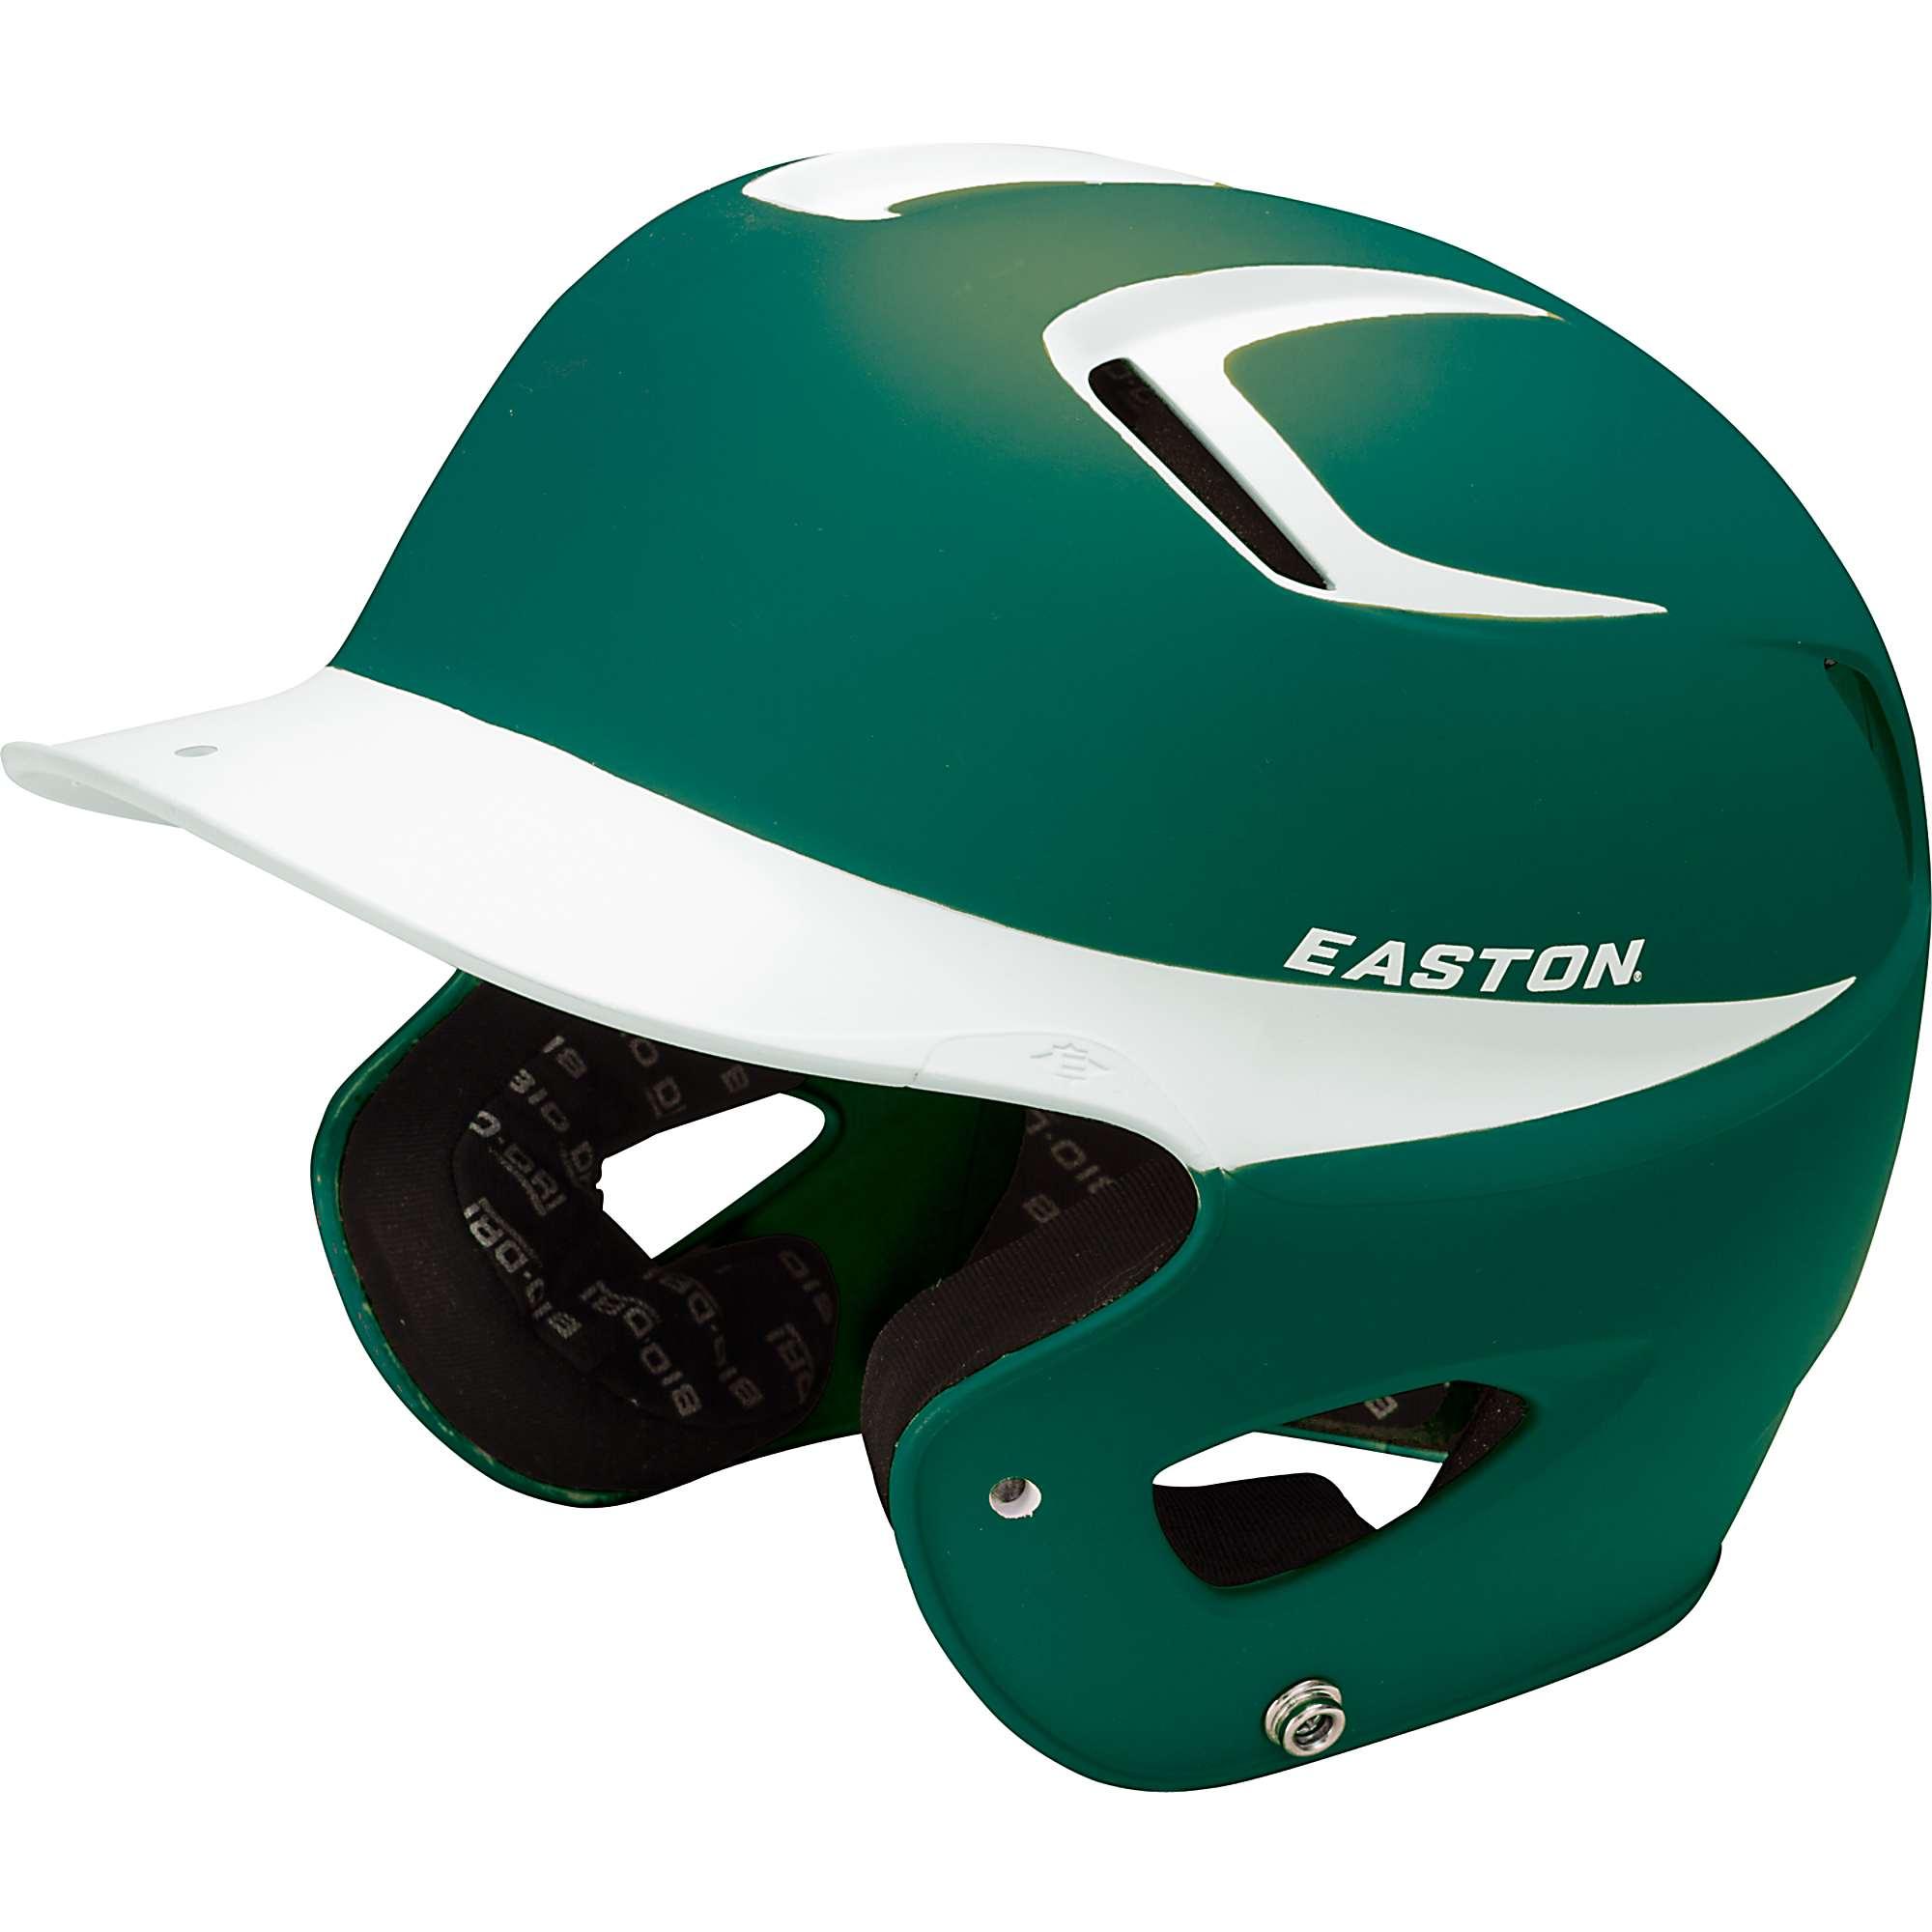 Easton Natural Grip Little League World Series Senior Batting Helmet